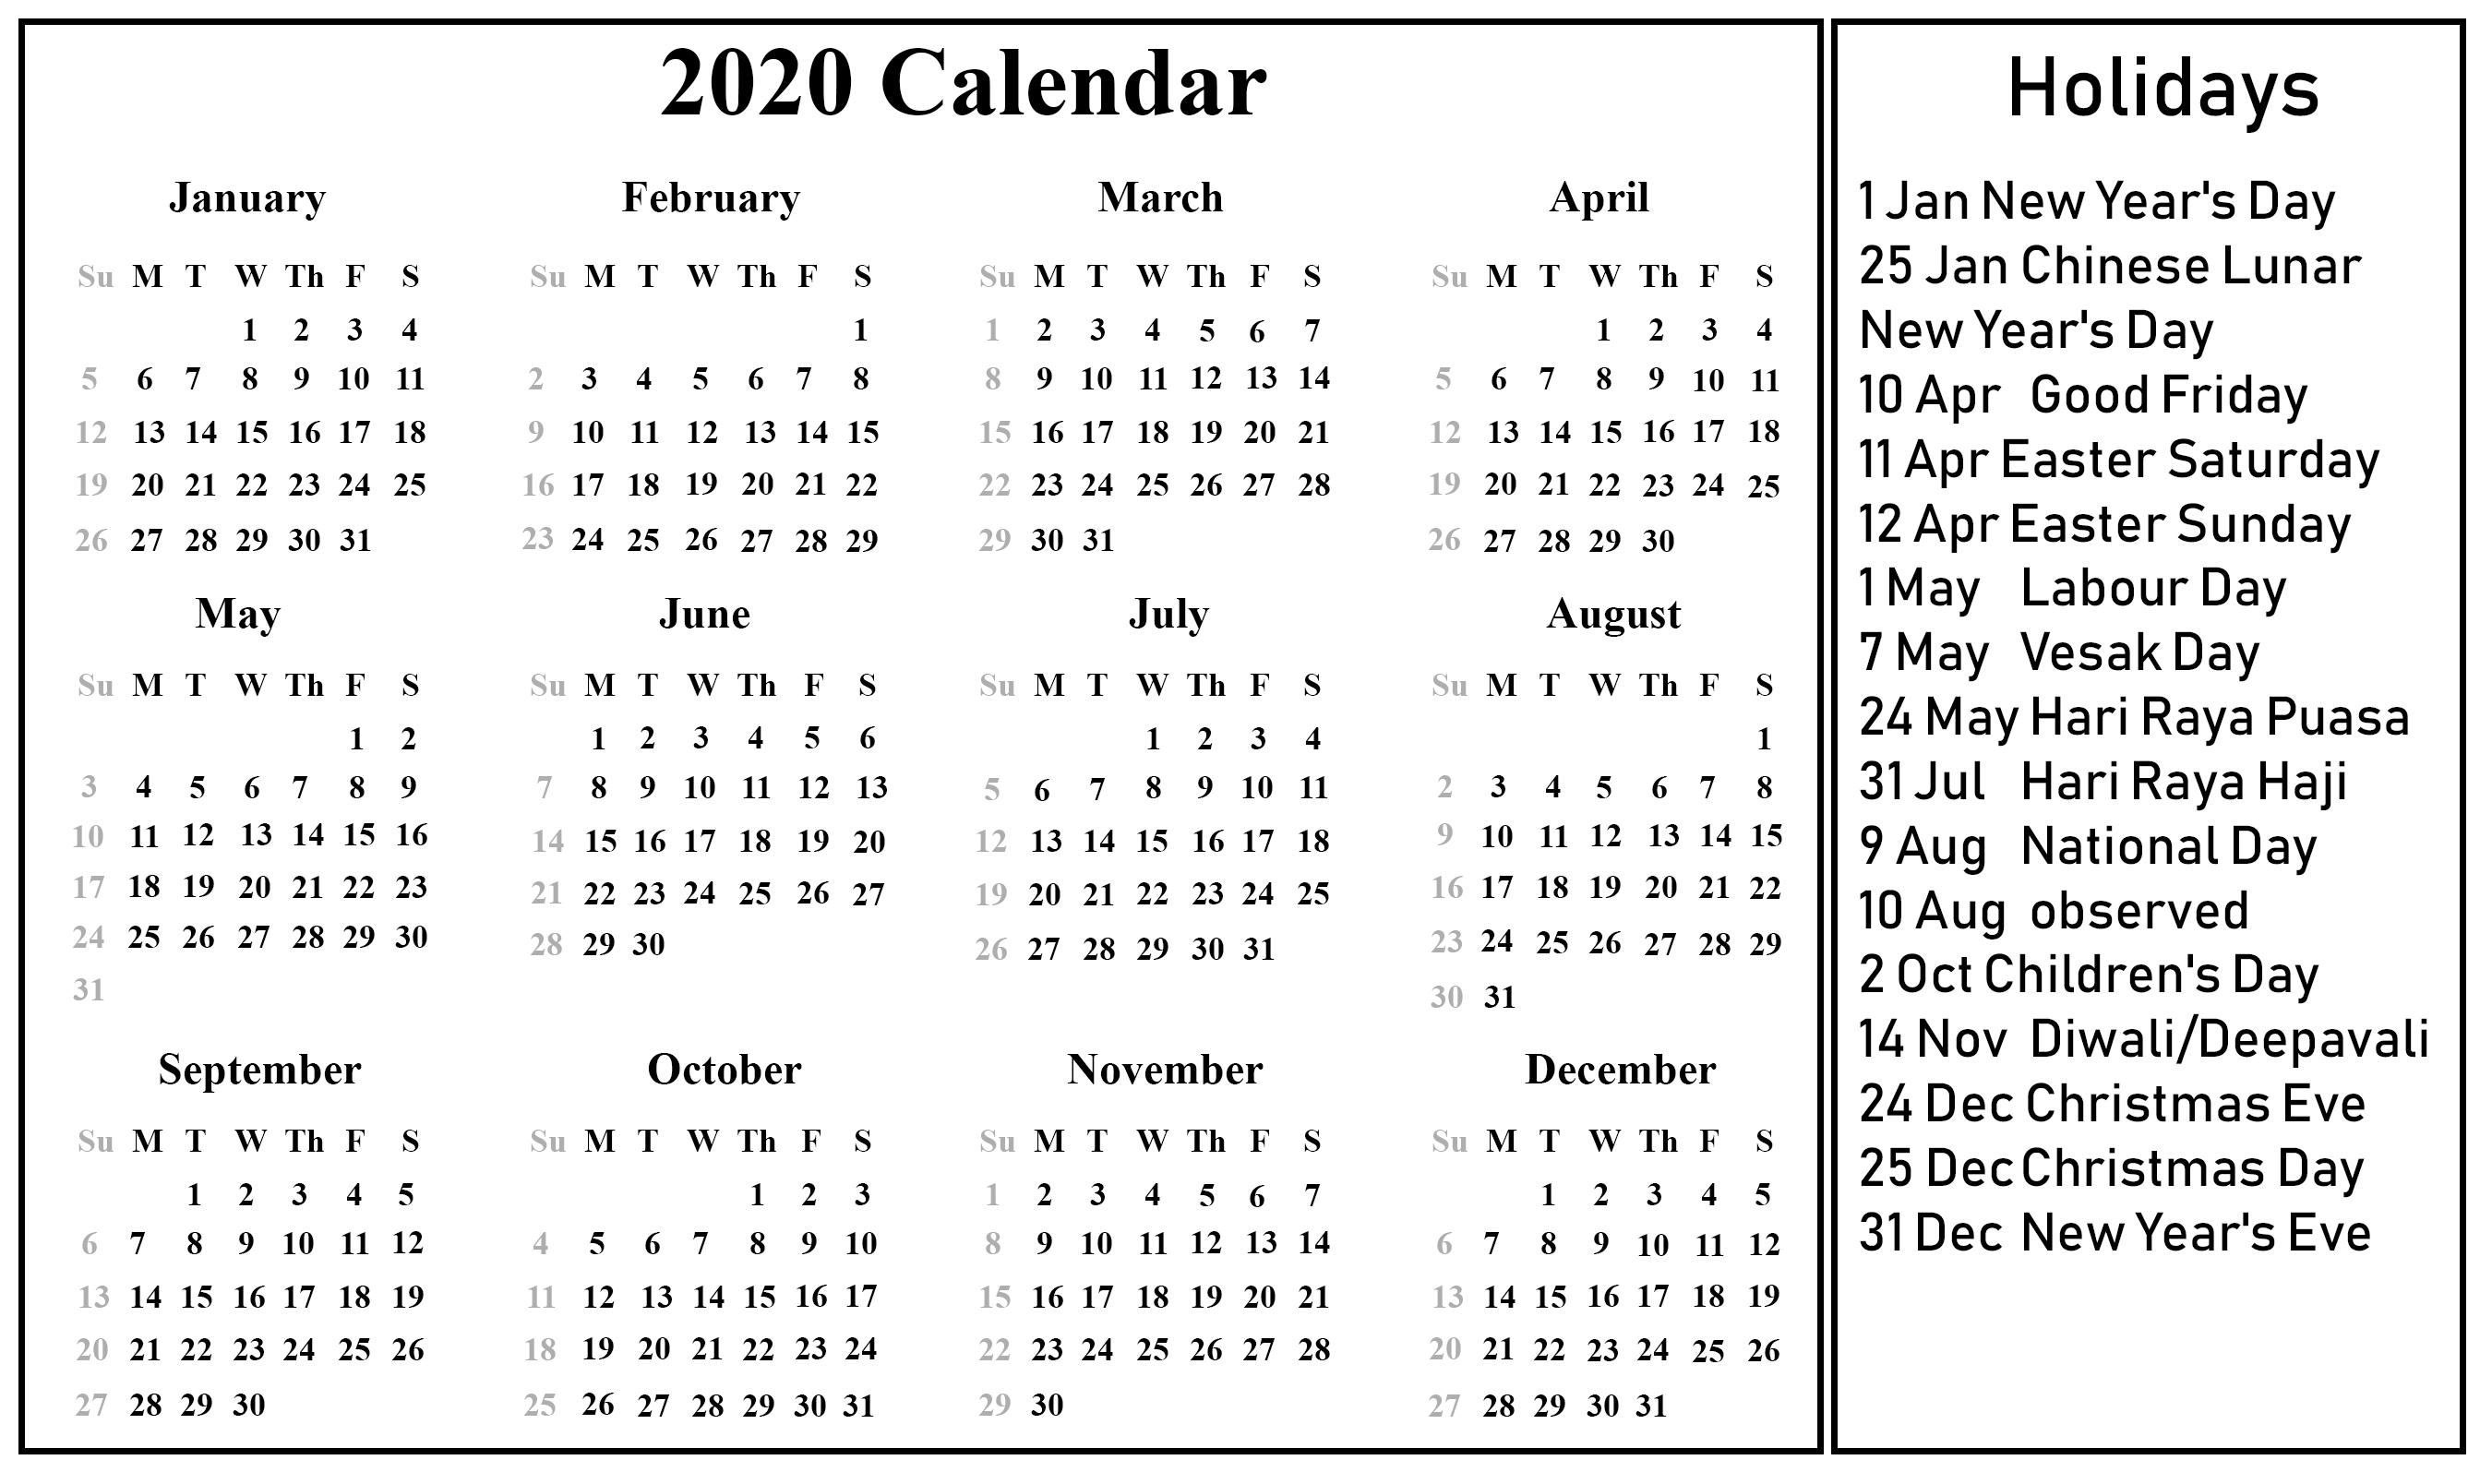 Free Download Singapore Calendar 2020 {Pdf, Excel & Word-Calendar With Public Holidays 2020